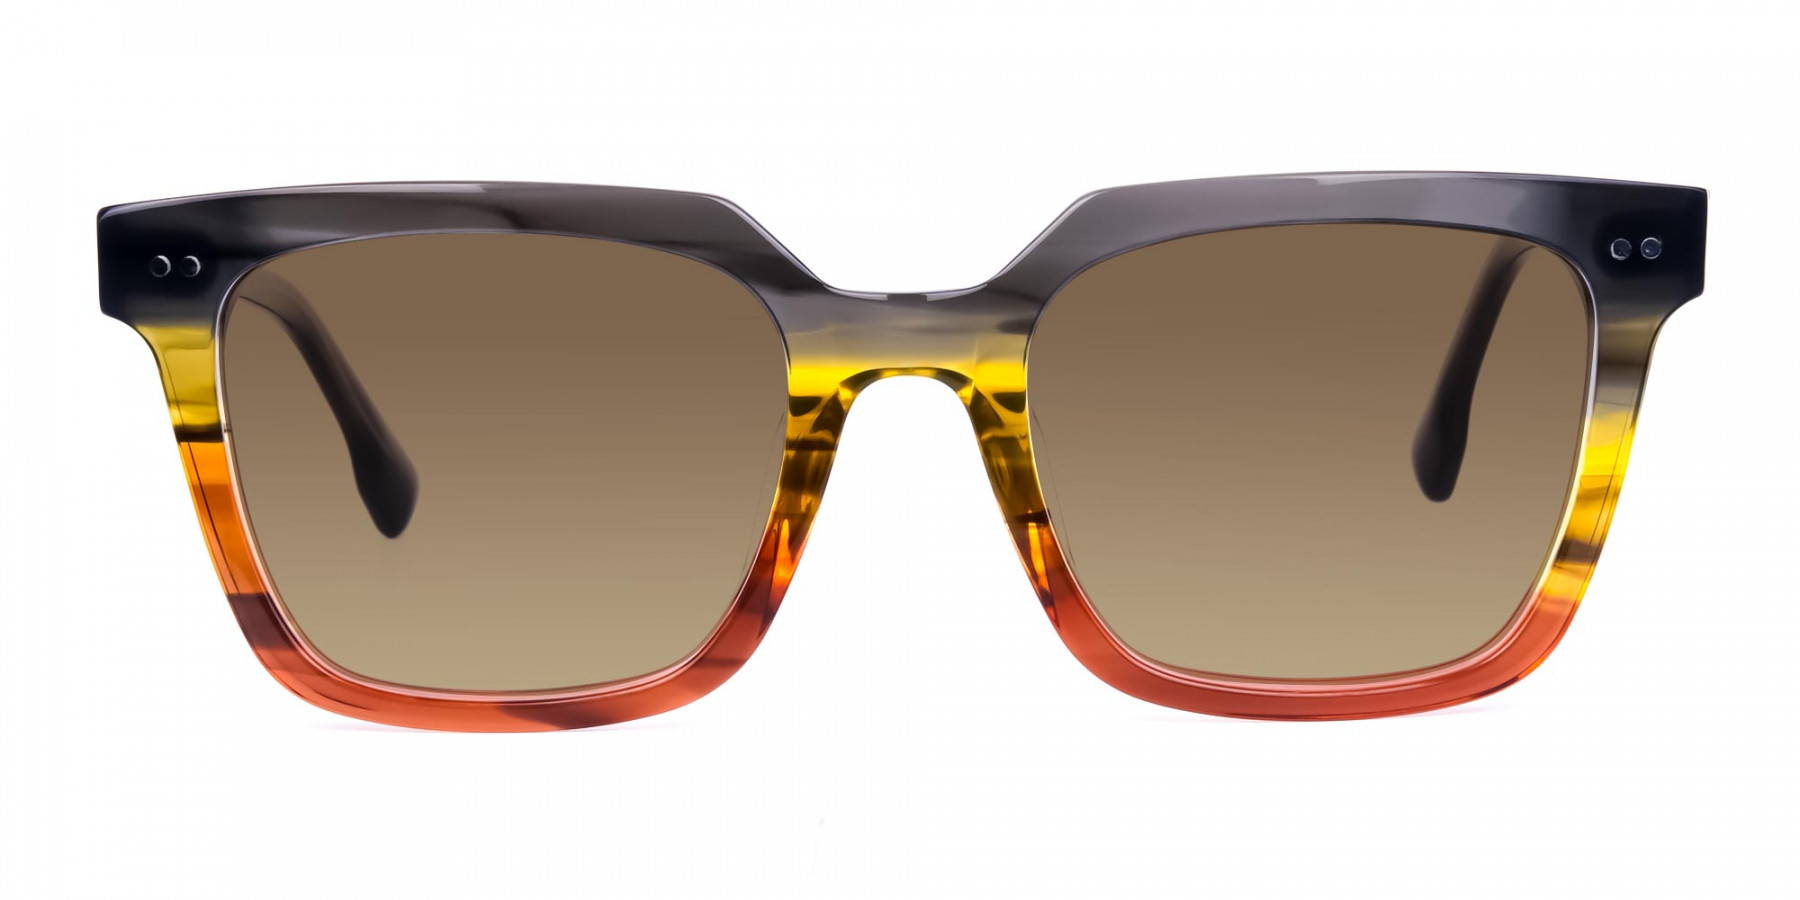 Wayfarer-Brown-Sunglasses-with-Brown-Tint-3